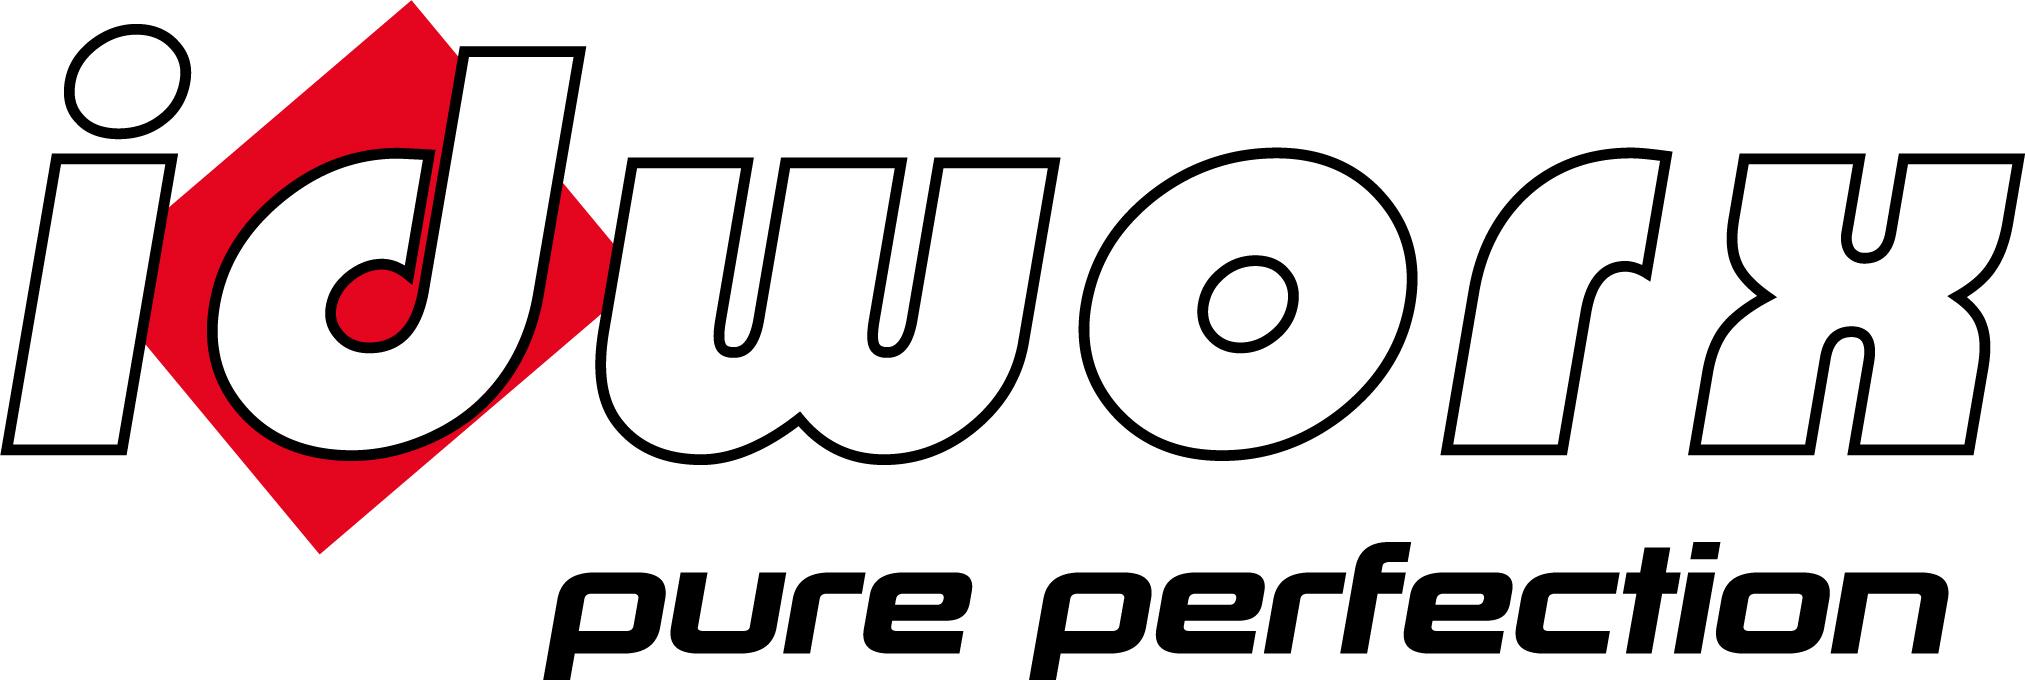 idworx_pure-perfection.jpg